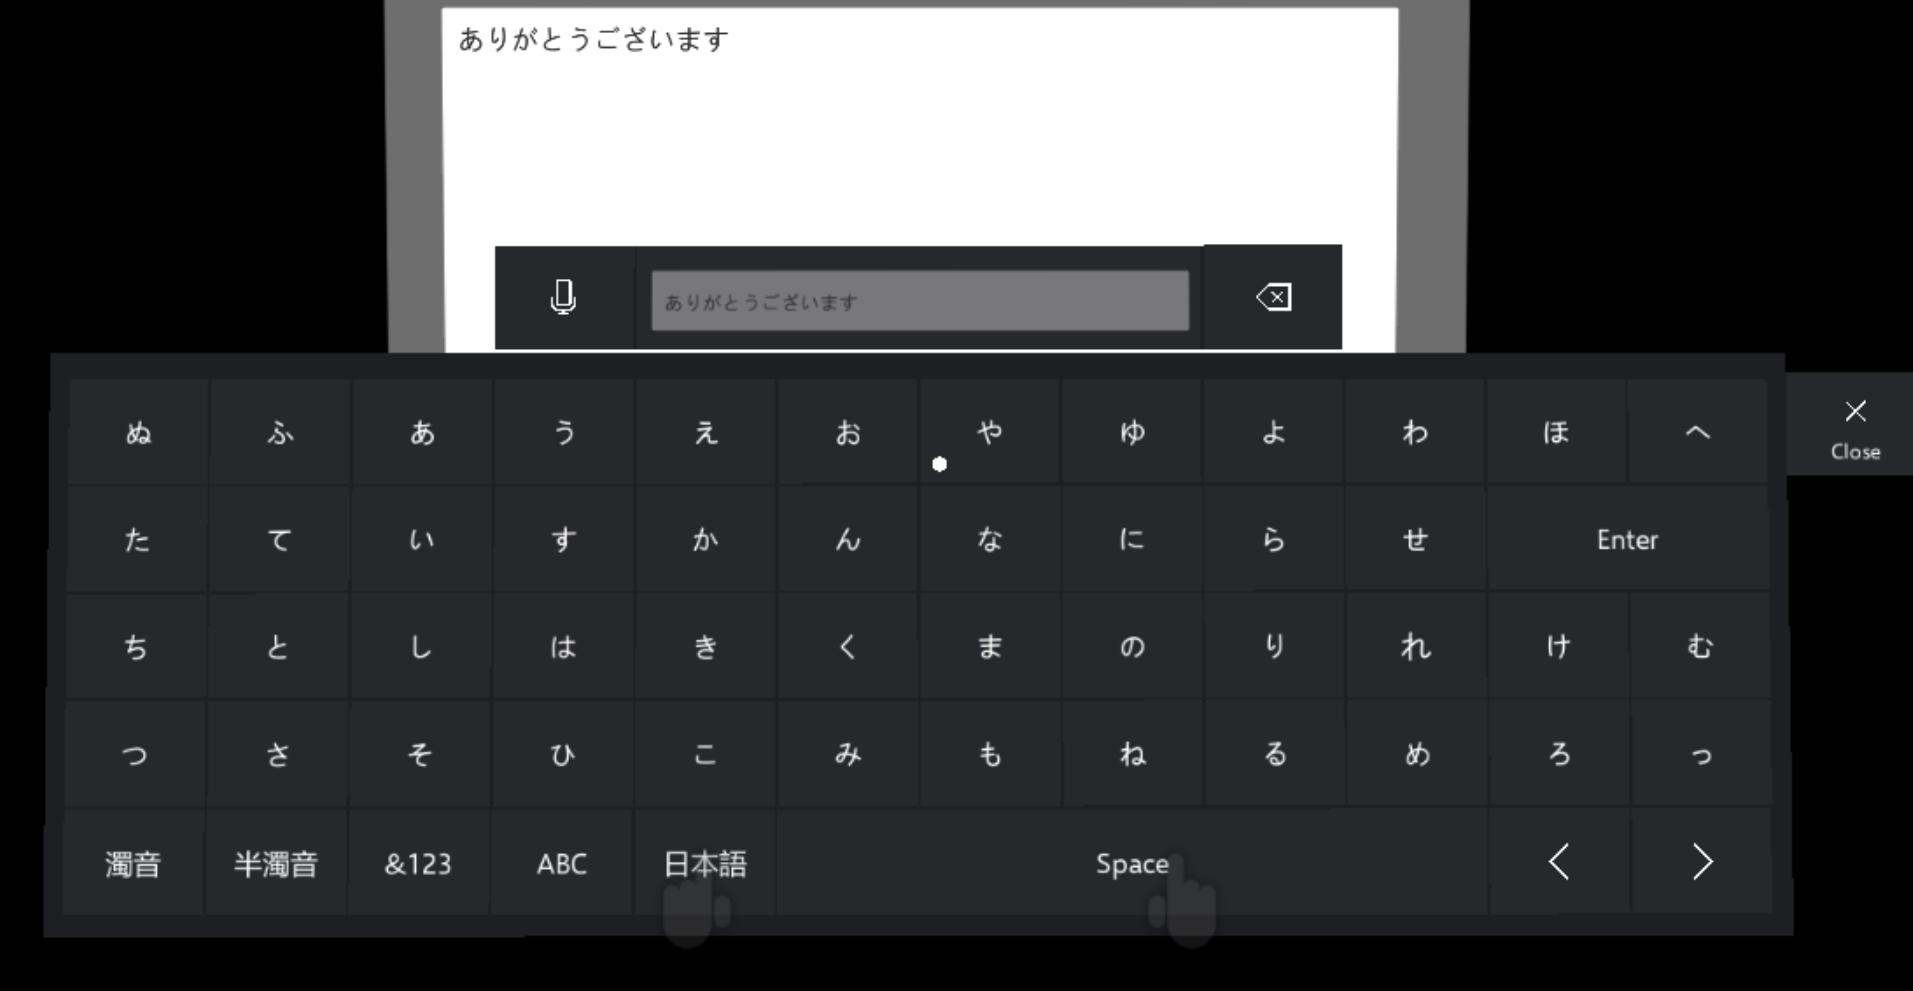 2017-06-21 16_06_15-unity 5 6 0f3 personal 64bit - keyboardtest unity - holotoolkit-unity - pc ma